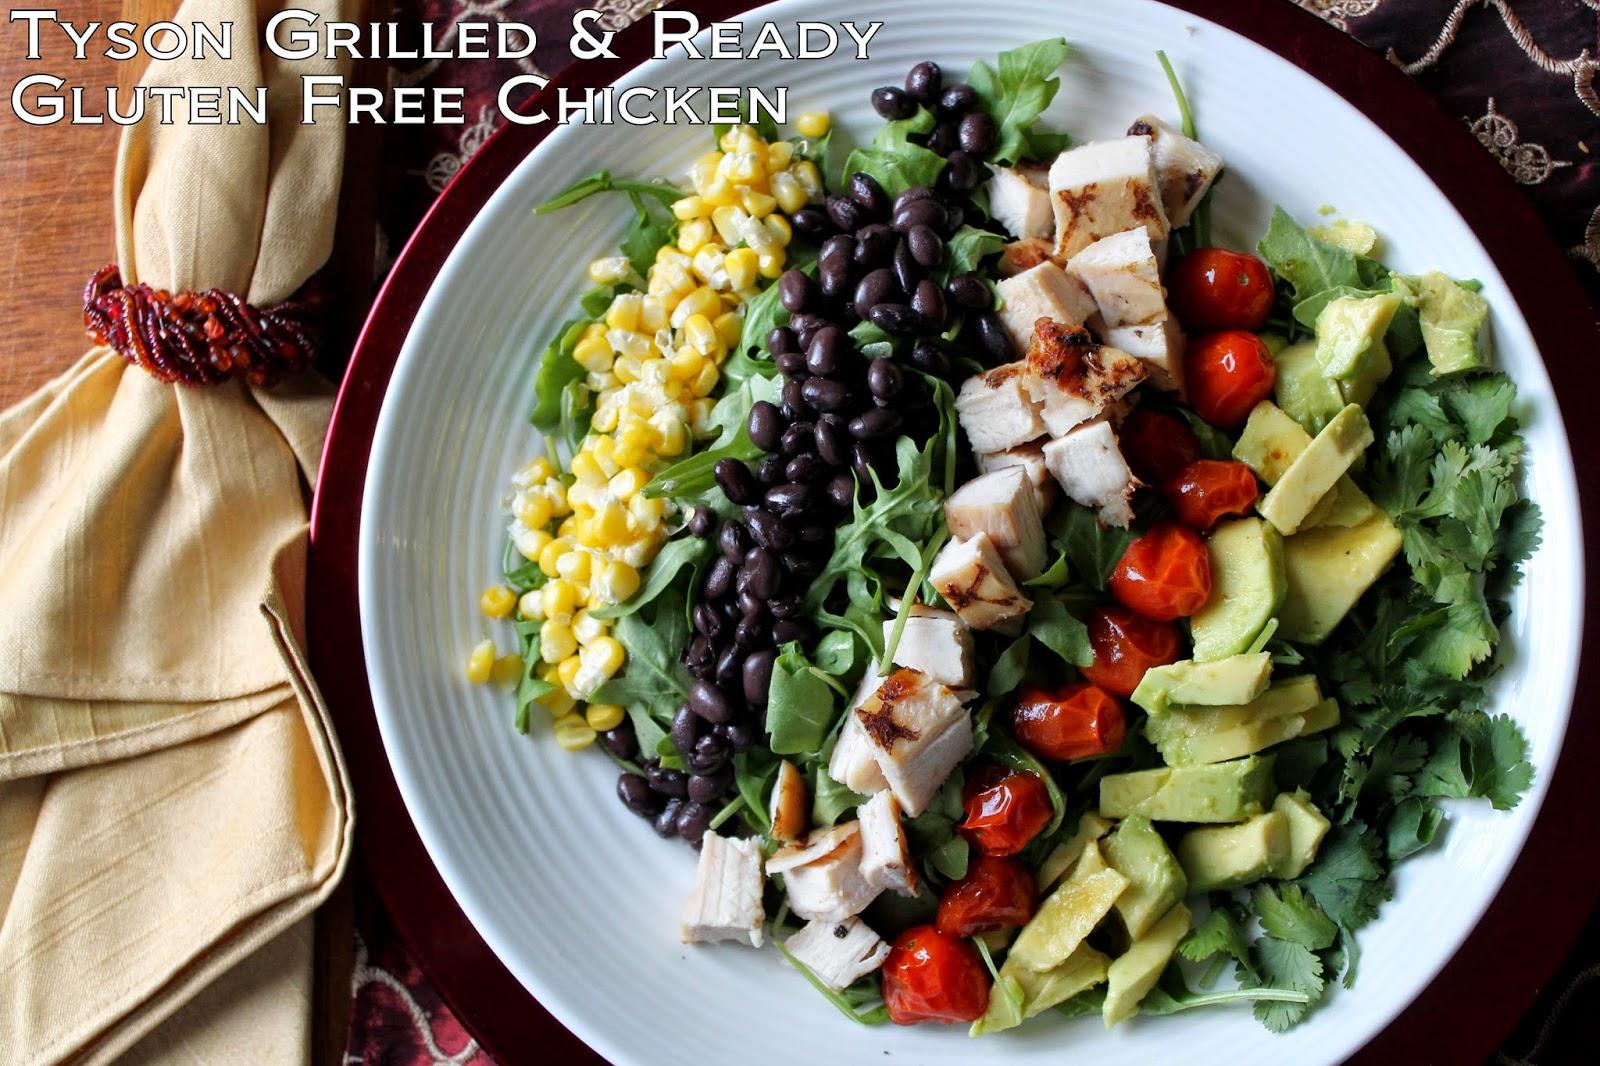 Ad Tyson Gluten Free Chicken Southwestern Cobb Salad Recipe Cookitgf I Run For Wine